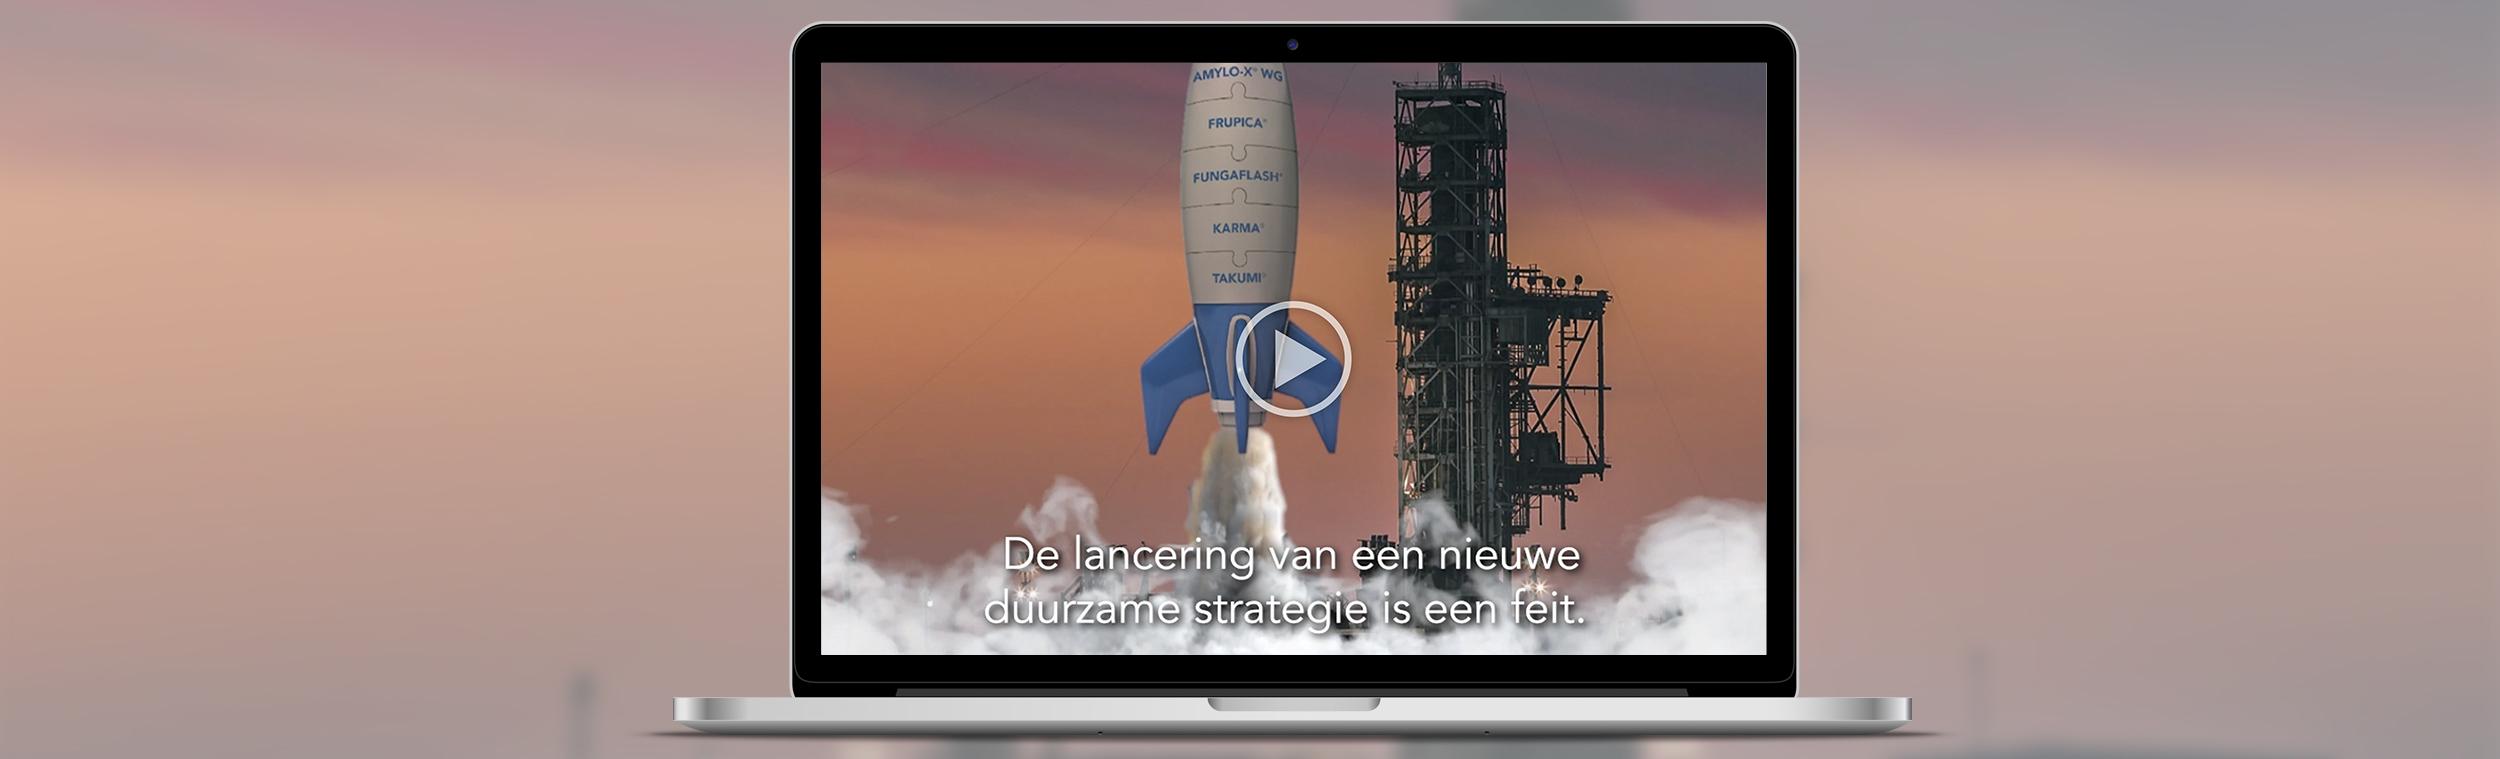 portfolio - certis_rocketscience_video